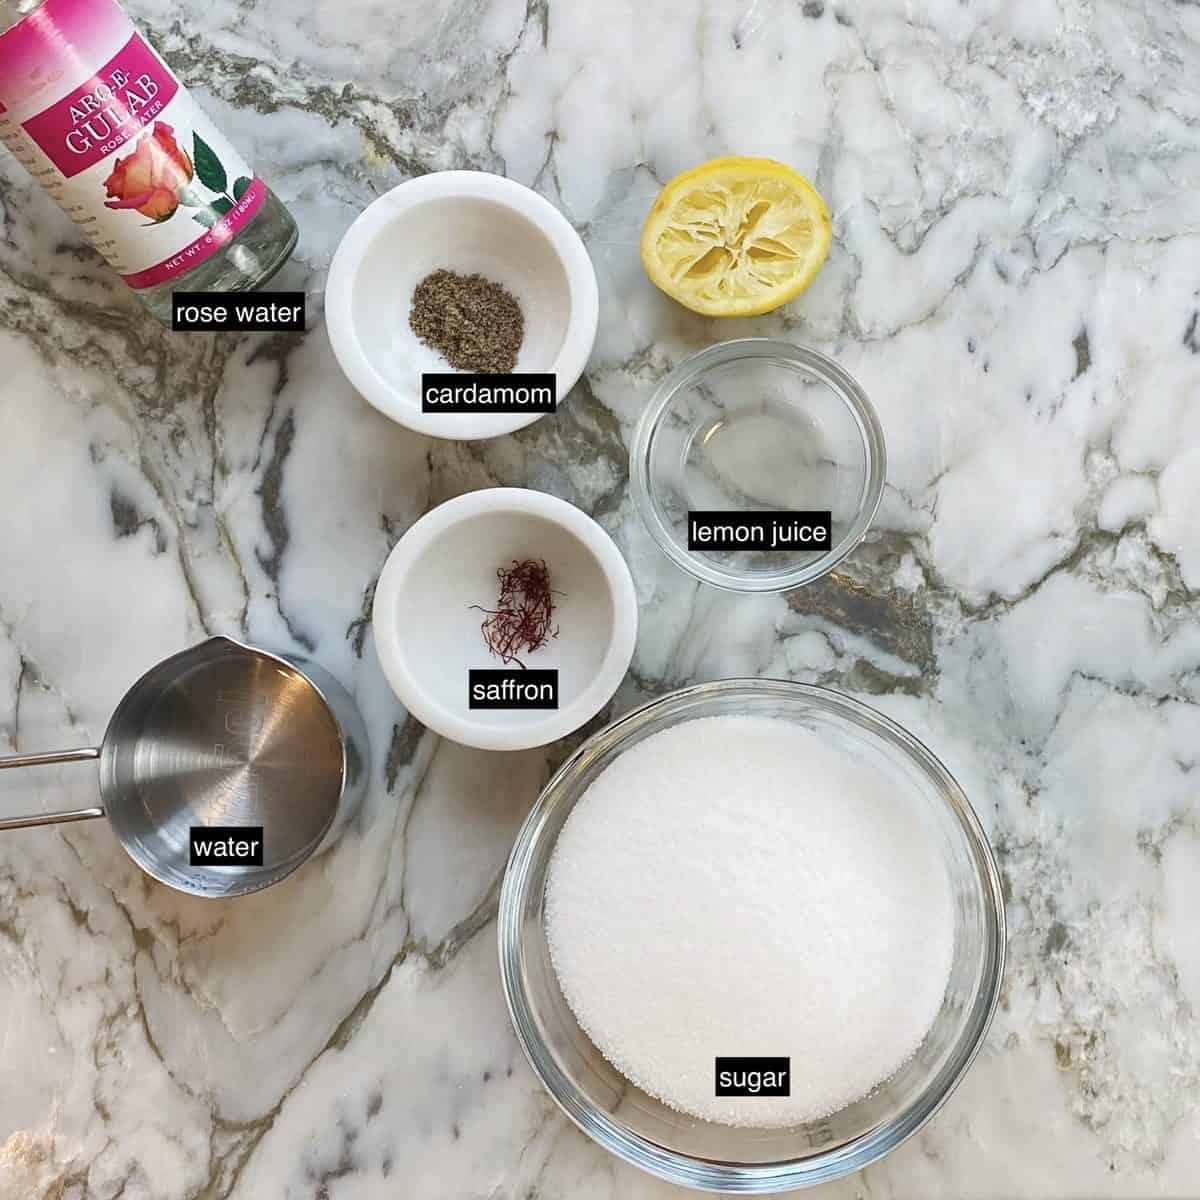 ingredients for sugar syrup